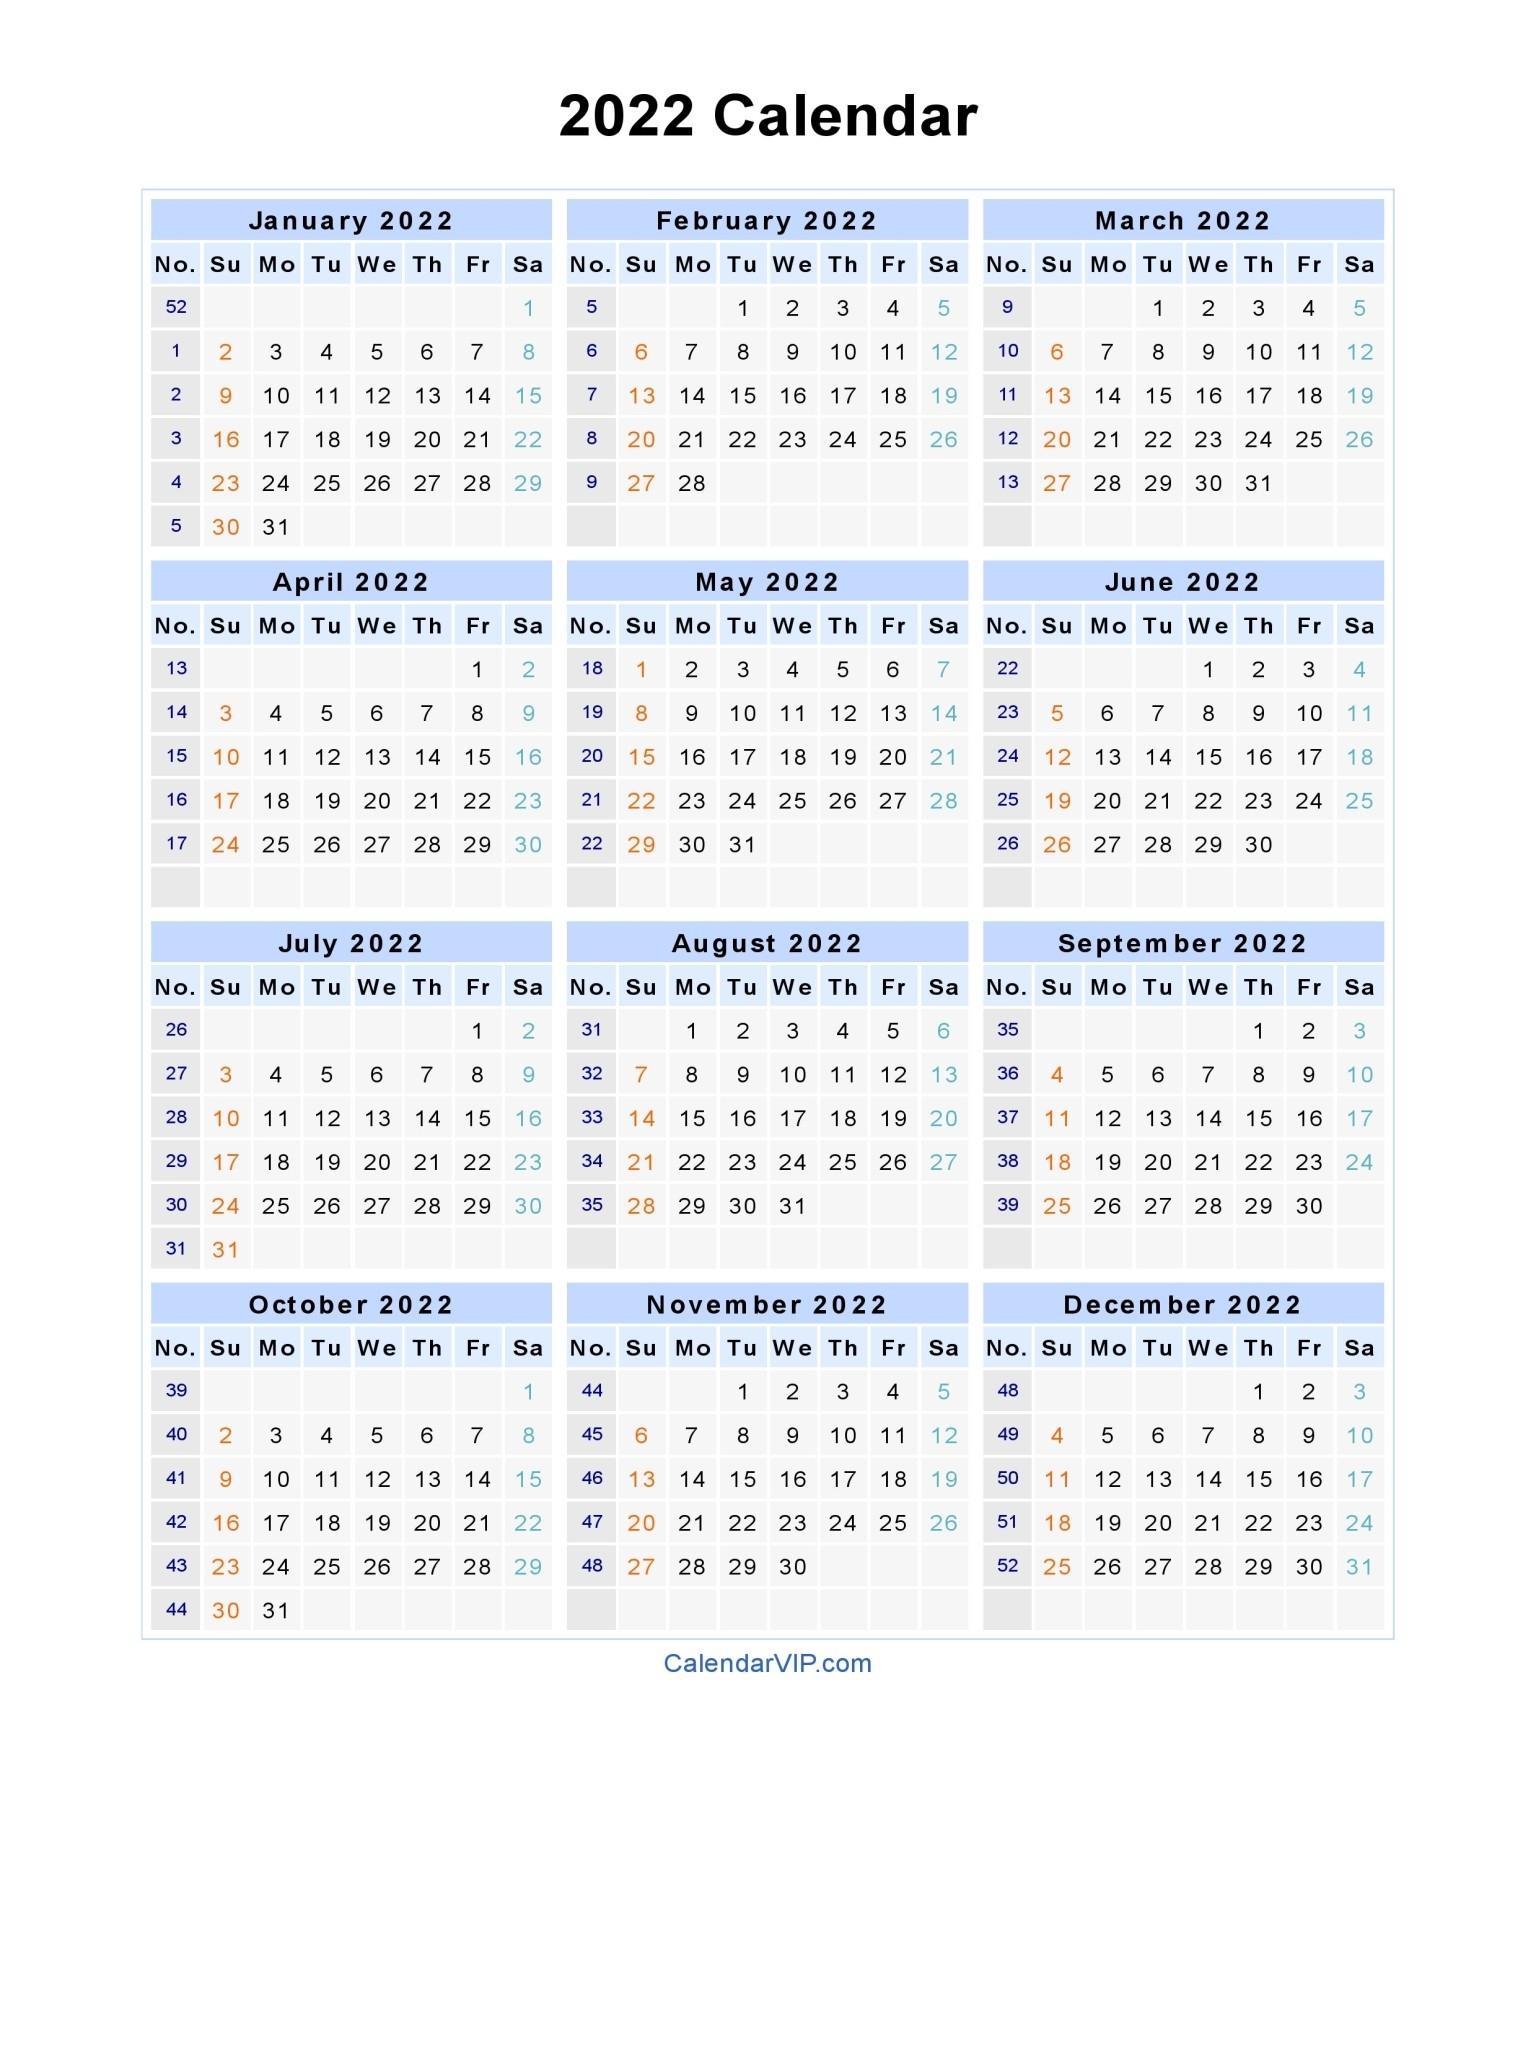 3 Year Calendars 2021 2022 2023 Free Printable | Calendar ...